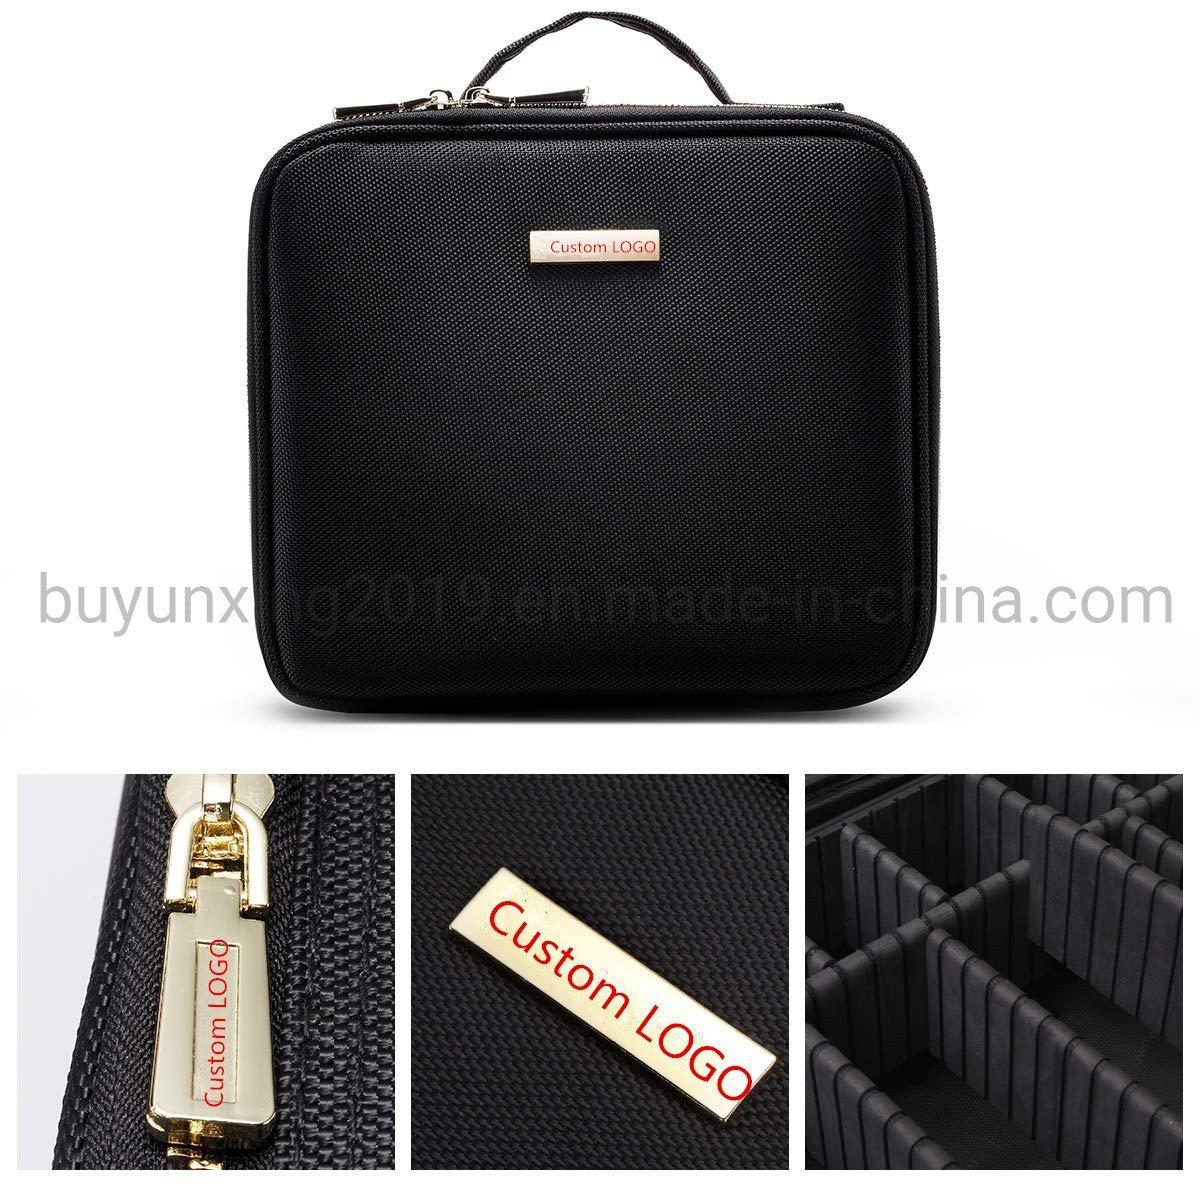 China Travel Bag Professional Cosmetic Makeup Organizer Case Makeup Train Case Makeup Artist Bag Portable Cosmetic Bag China Makeup Bag And Beauty Bag Price